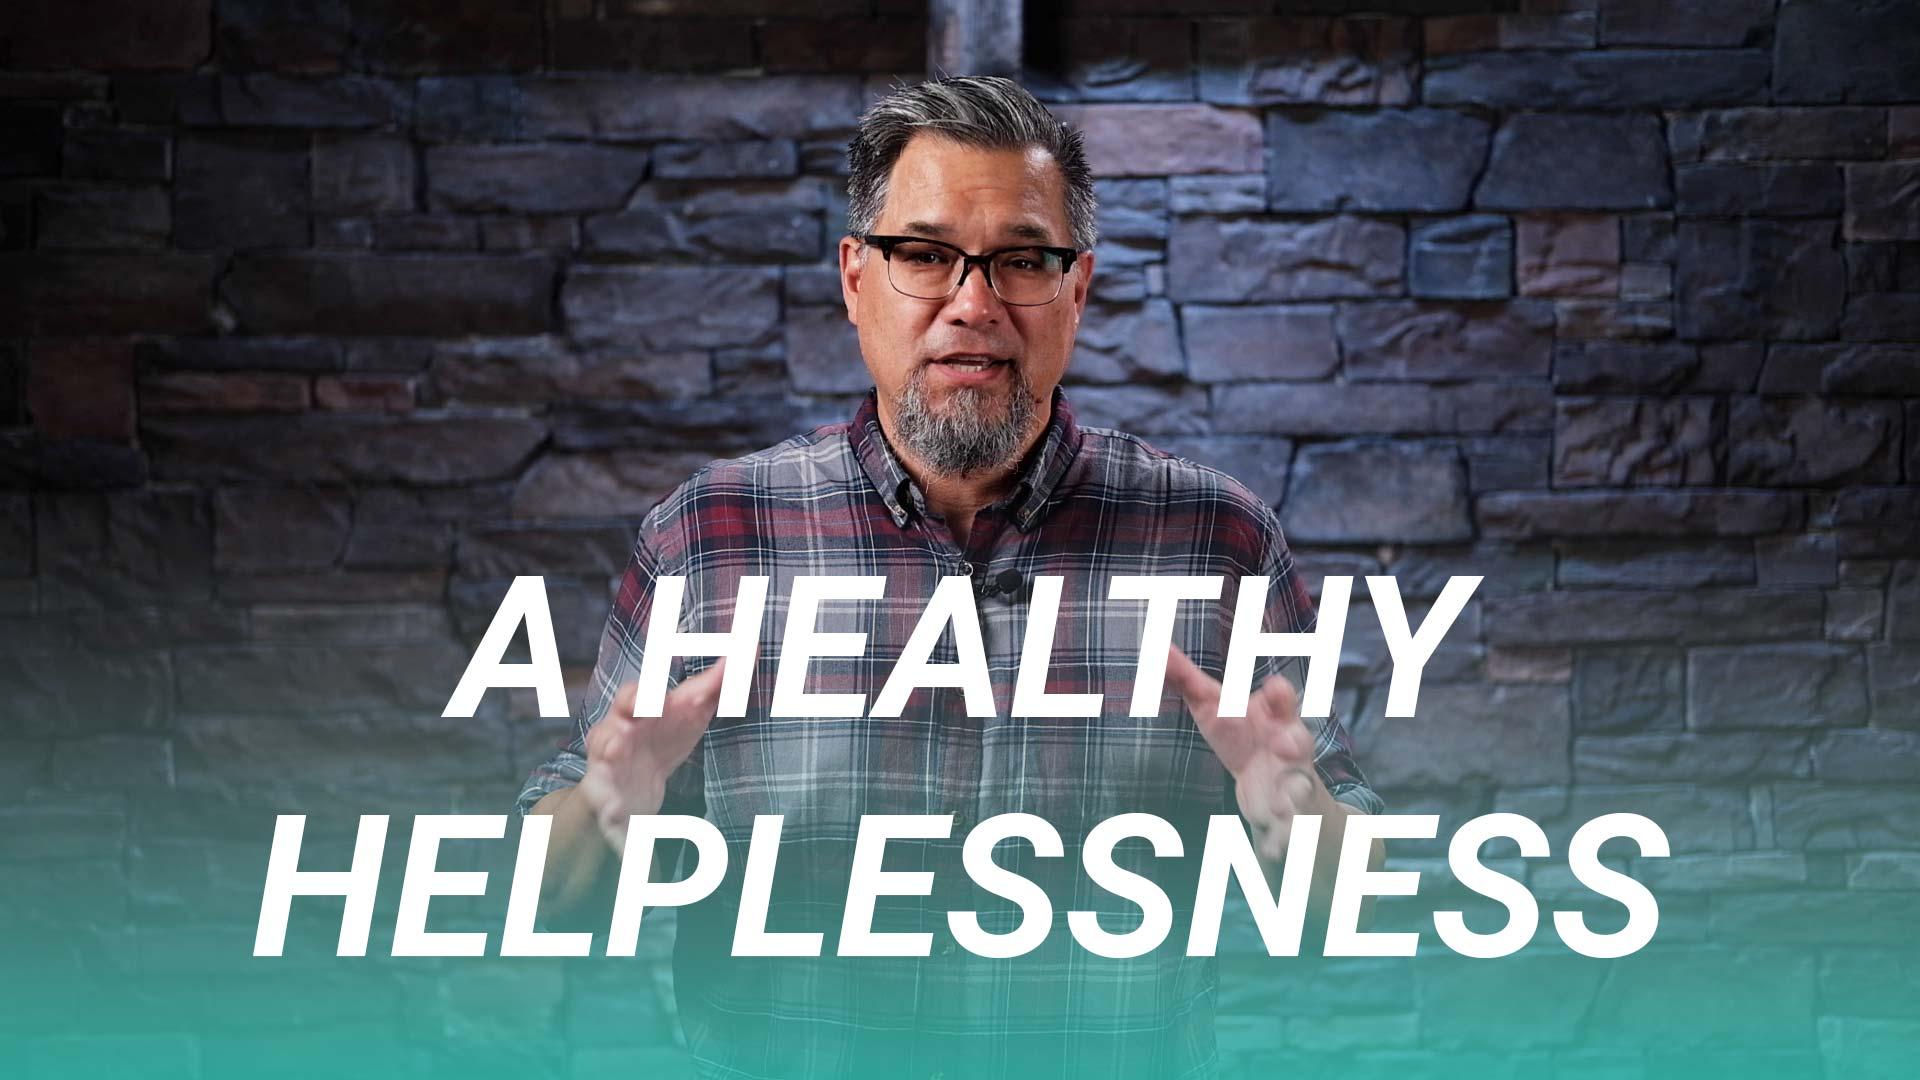 A Healthy Helplessness (John 15:1-11)